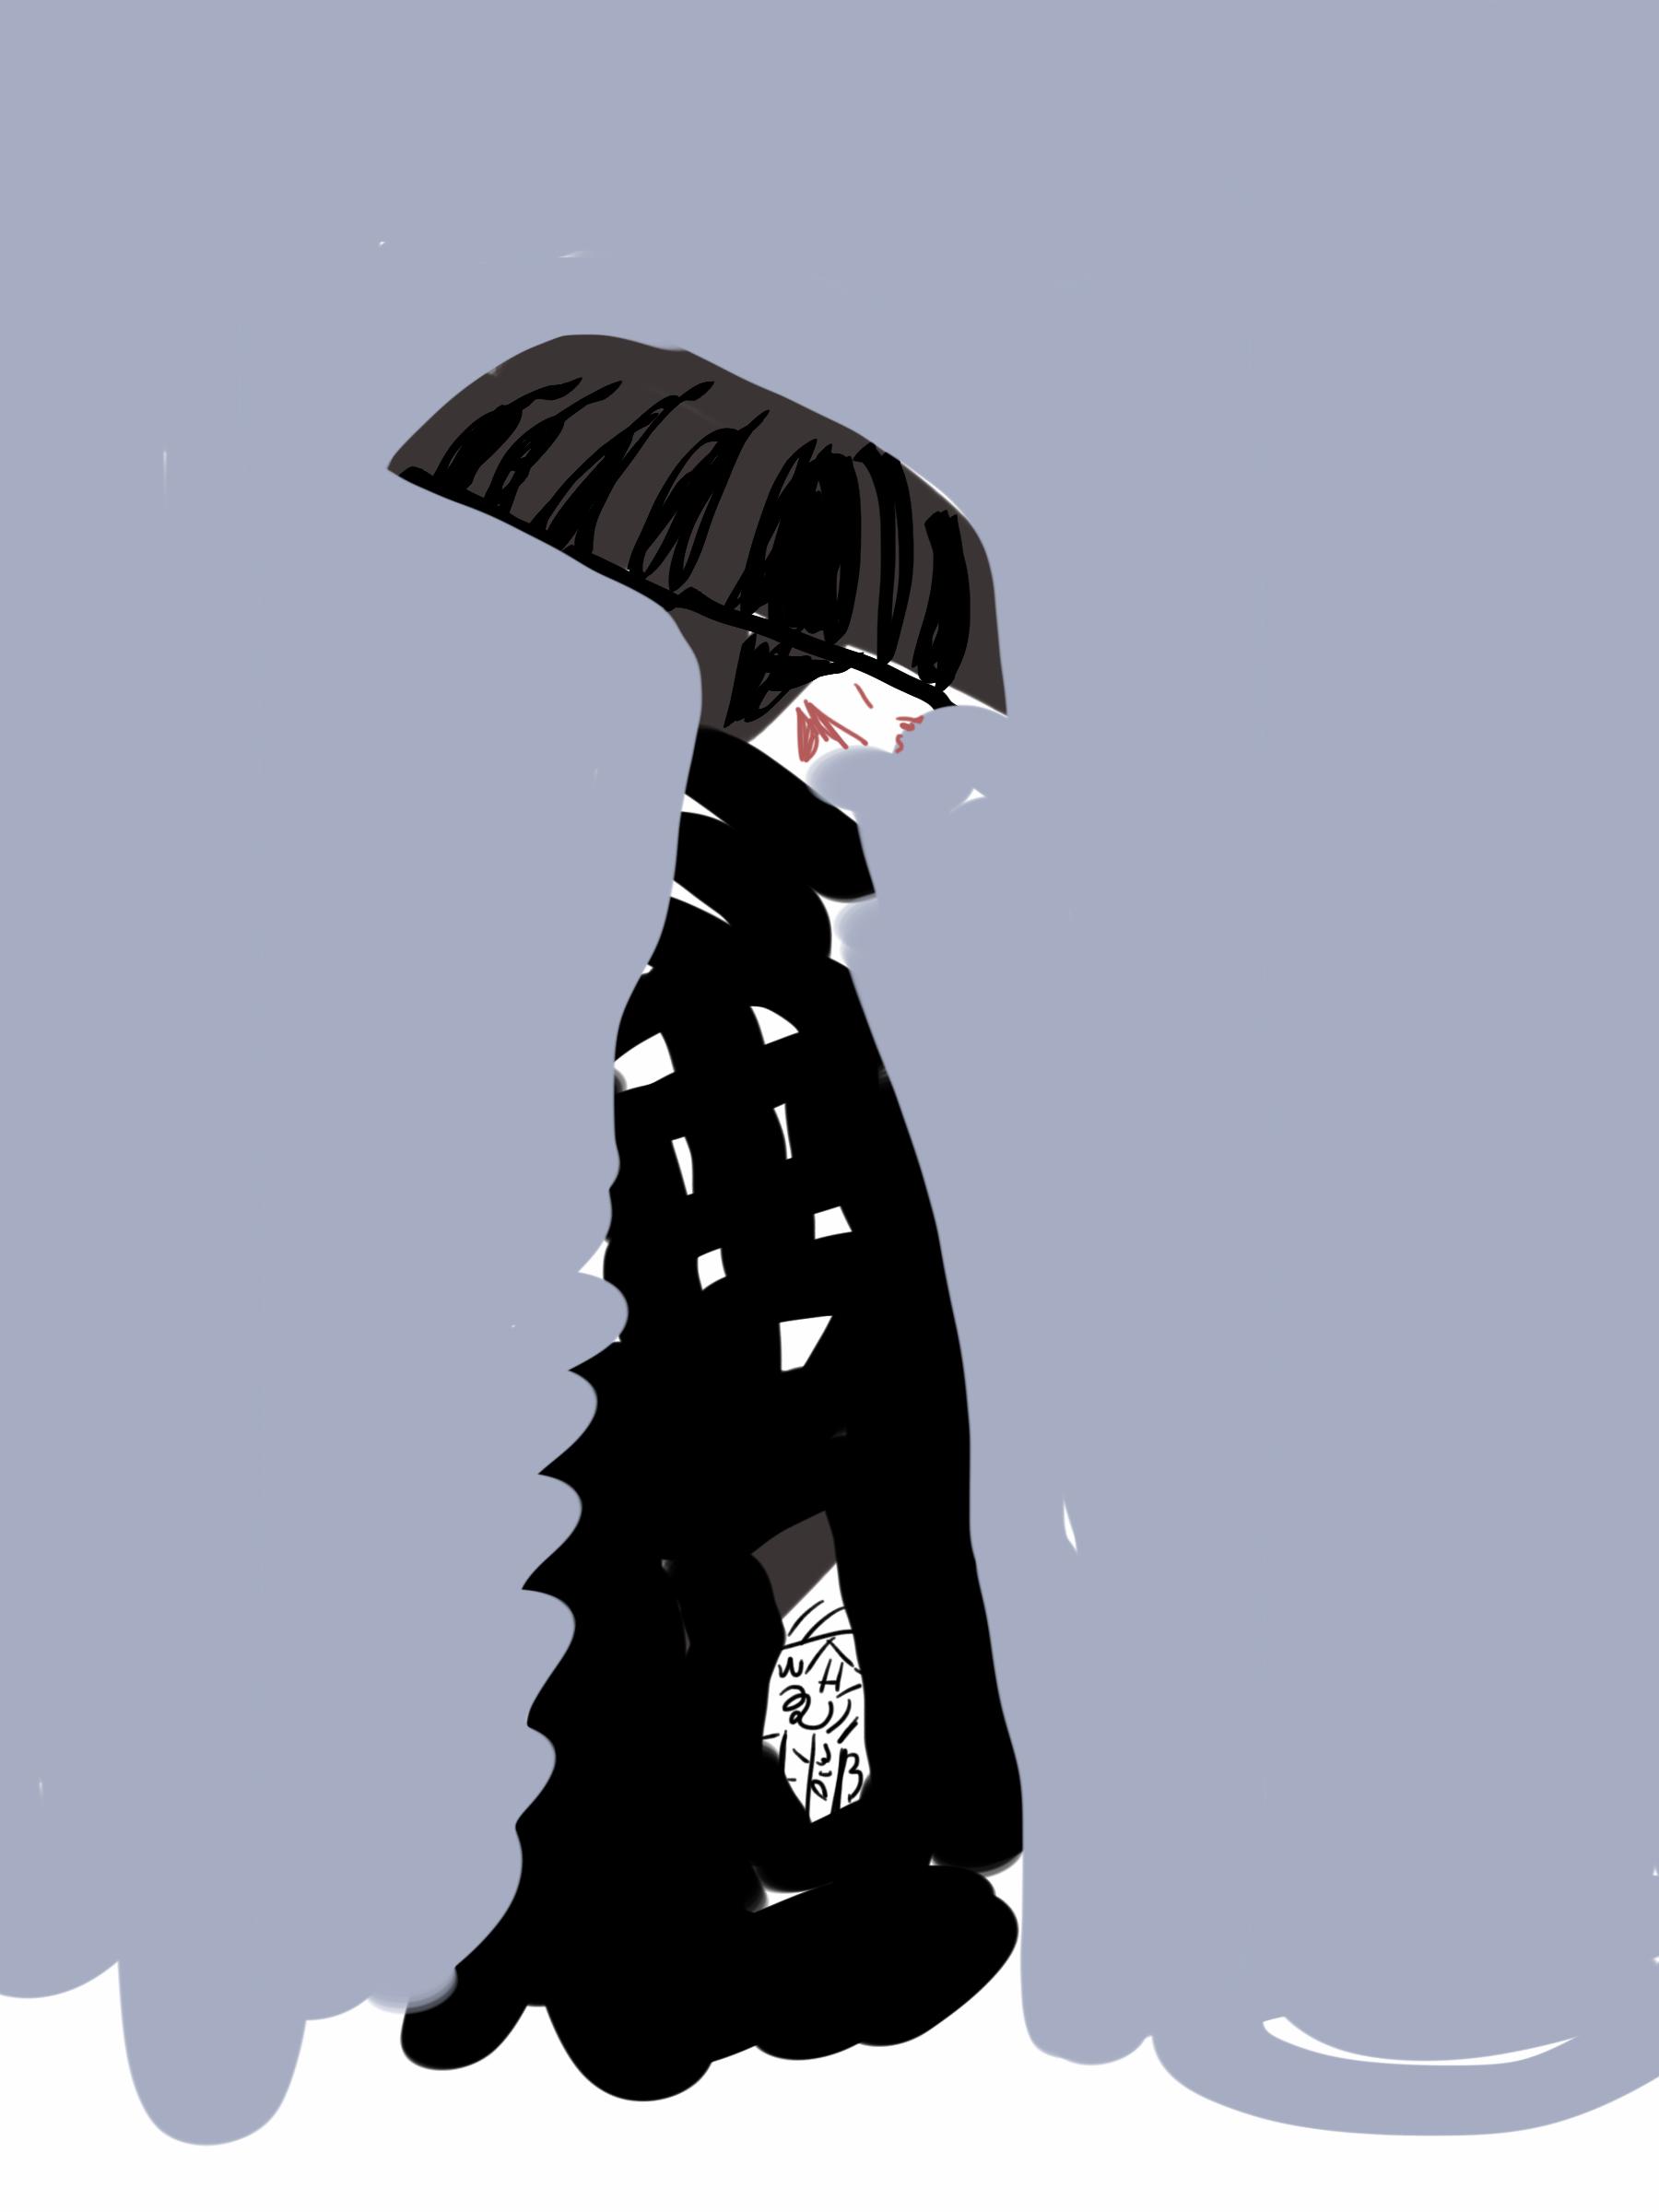 Watanabe Runway Illustration by Silvana Mariani